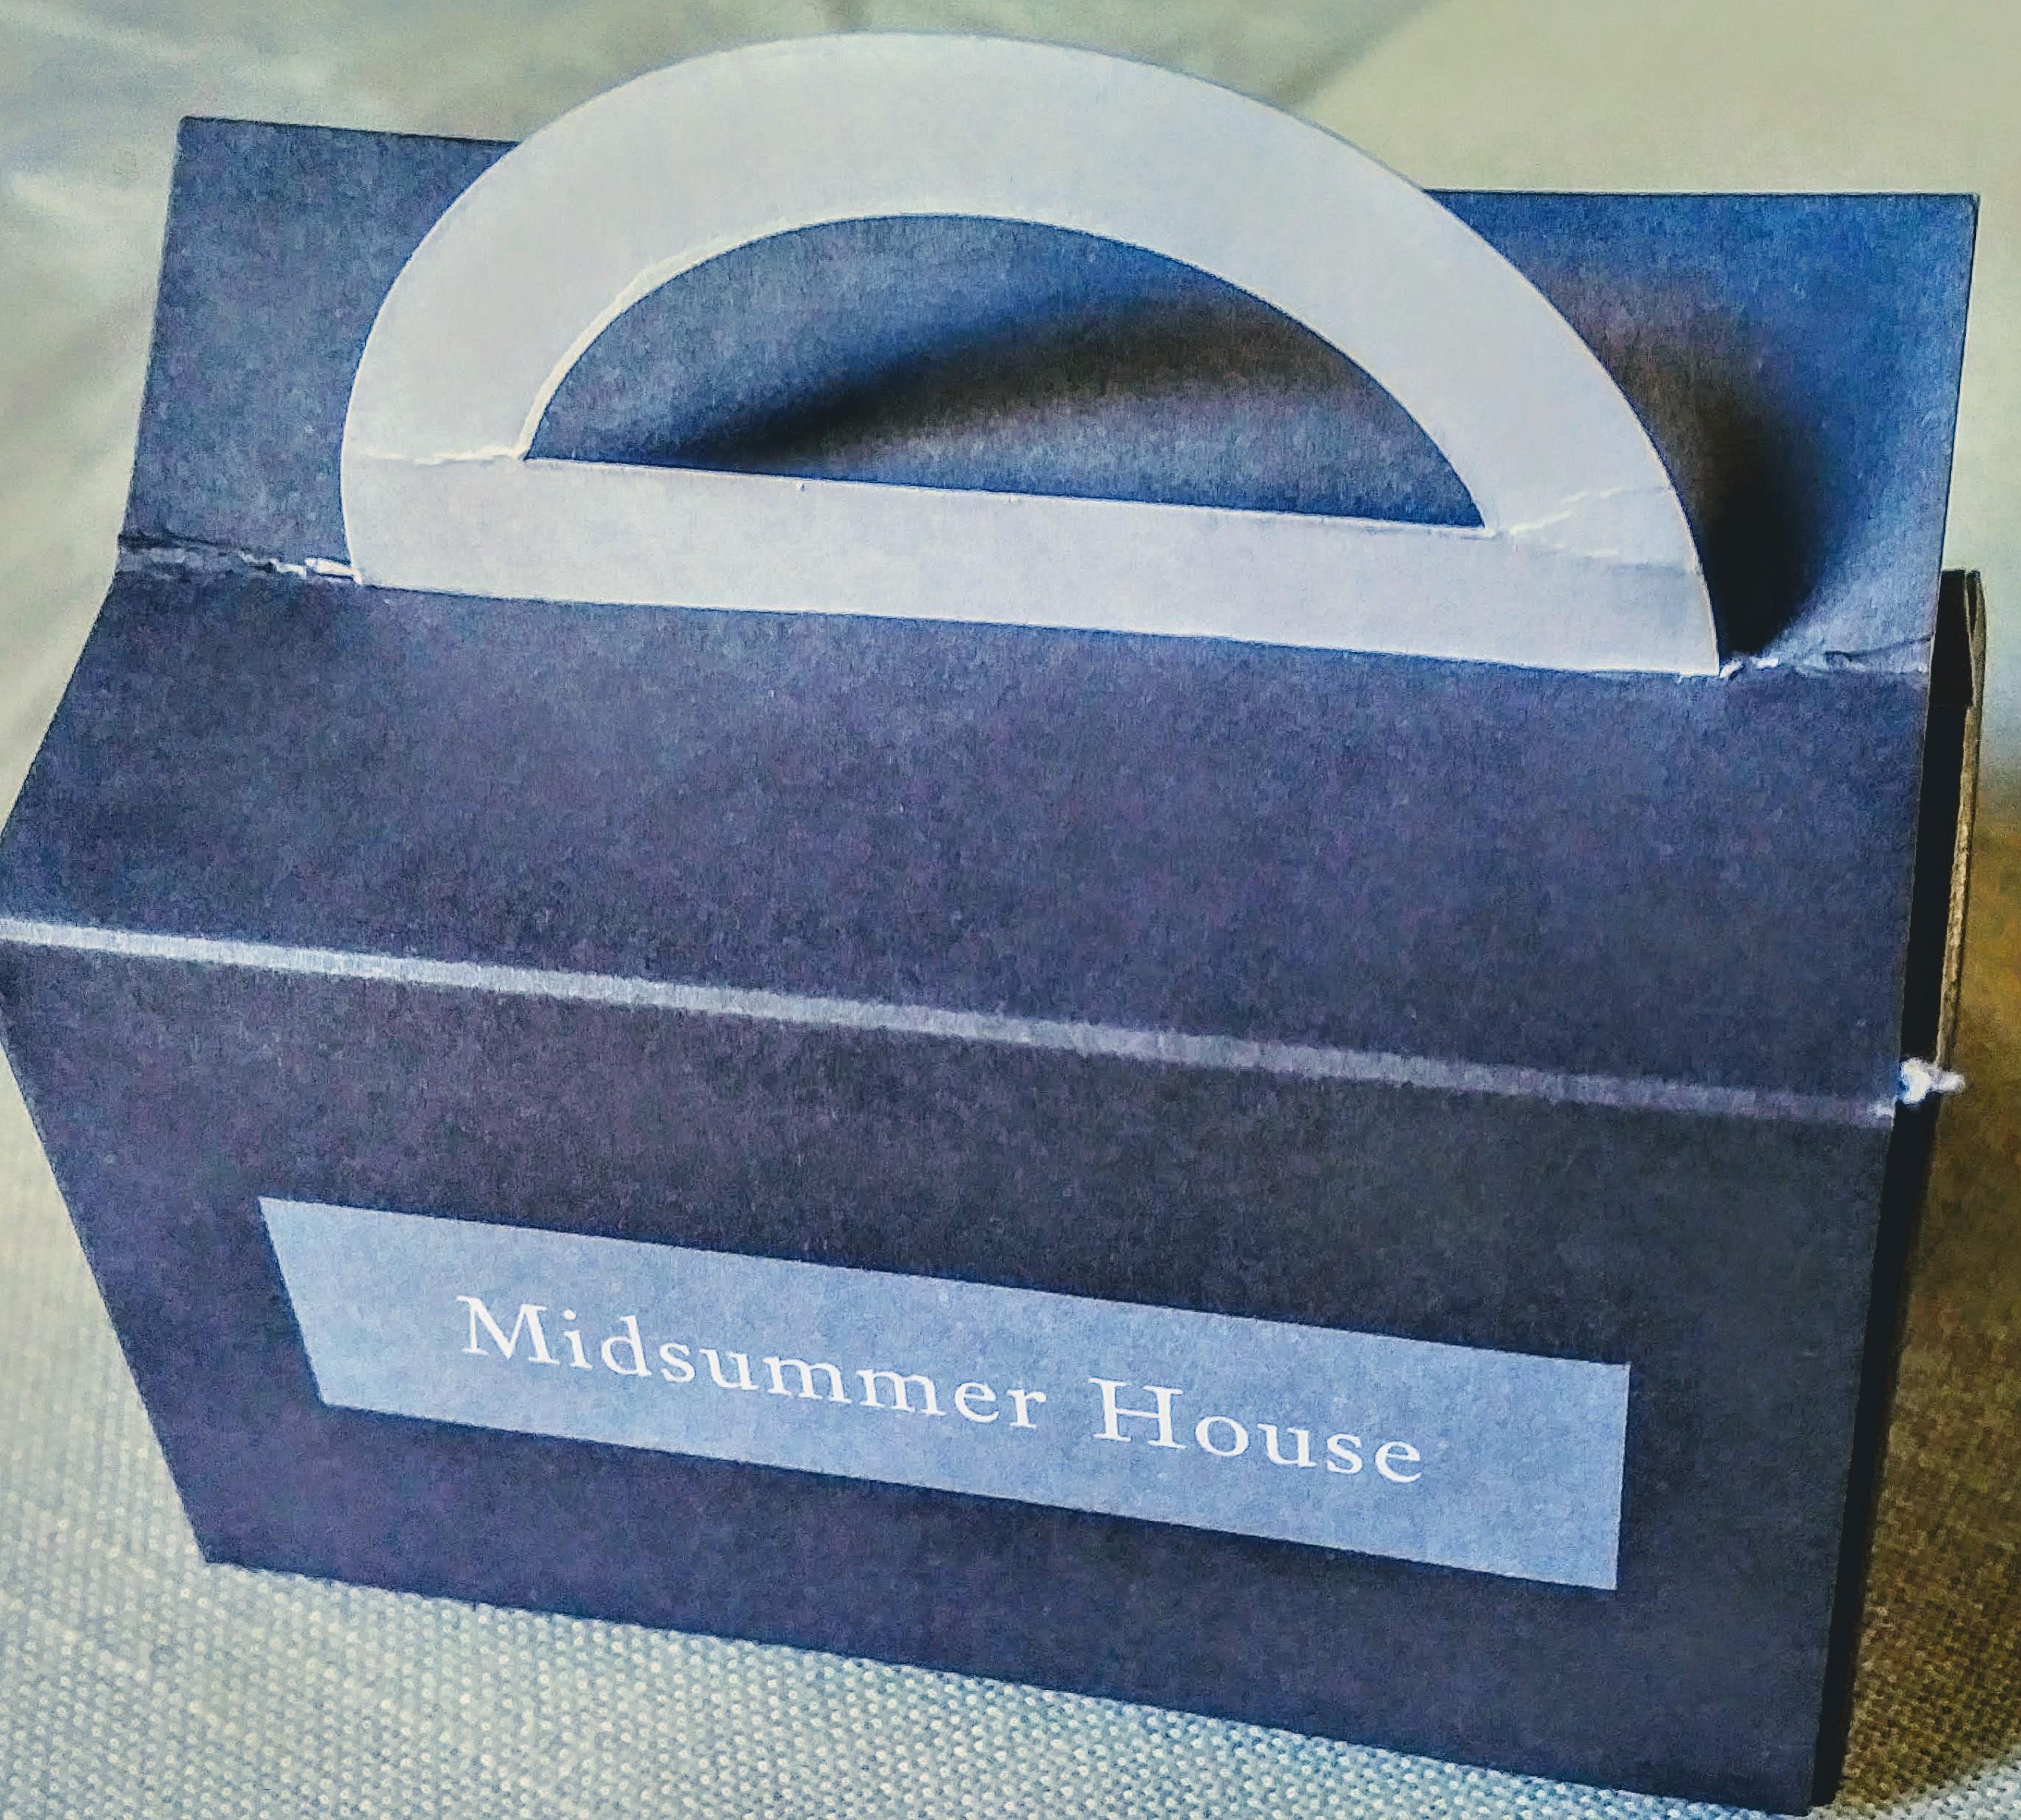 Midsummer House Restaurant Cambridge midsummer house, michelin star dining in cambridge: august